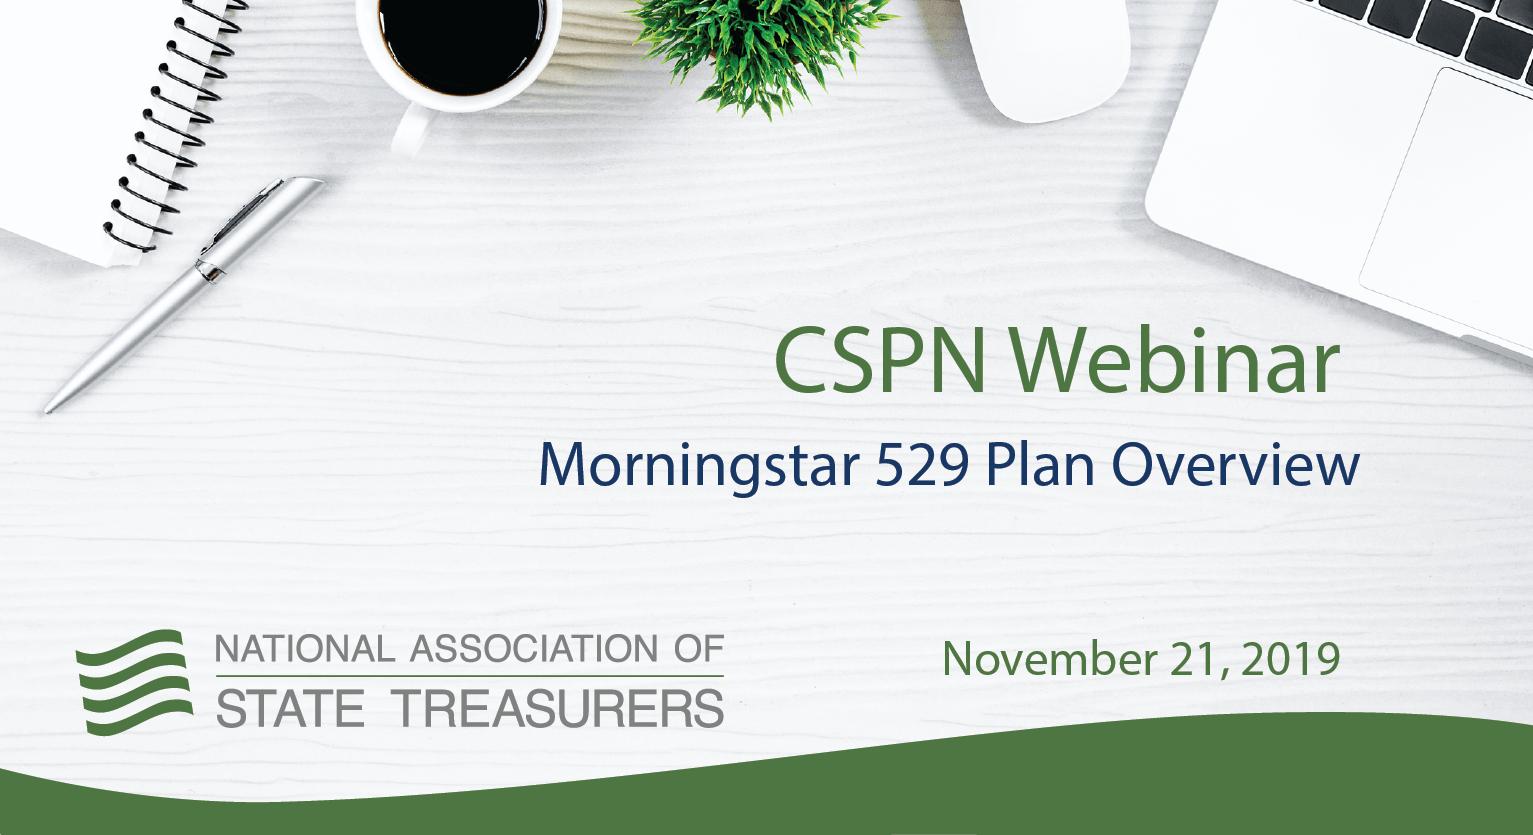 Morningstar 529 Plan Overview